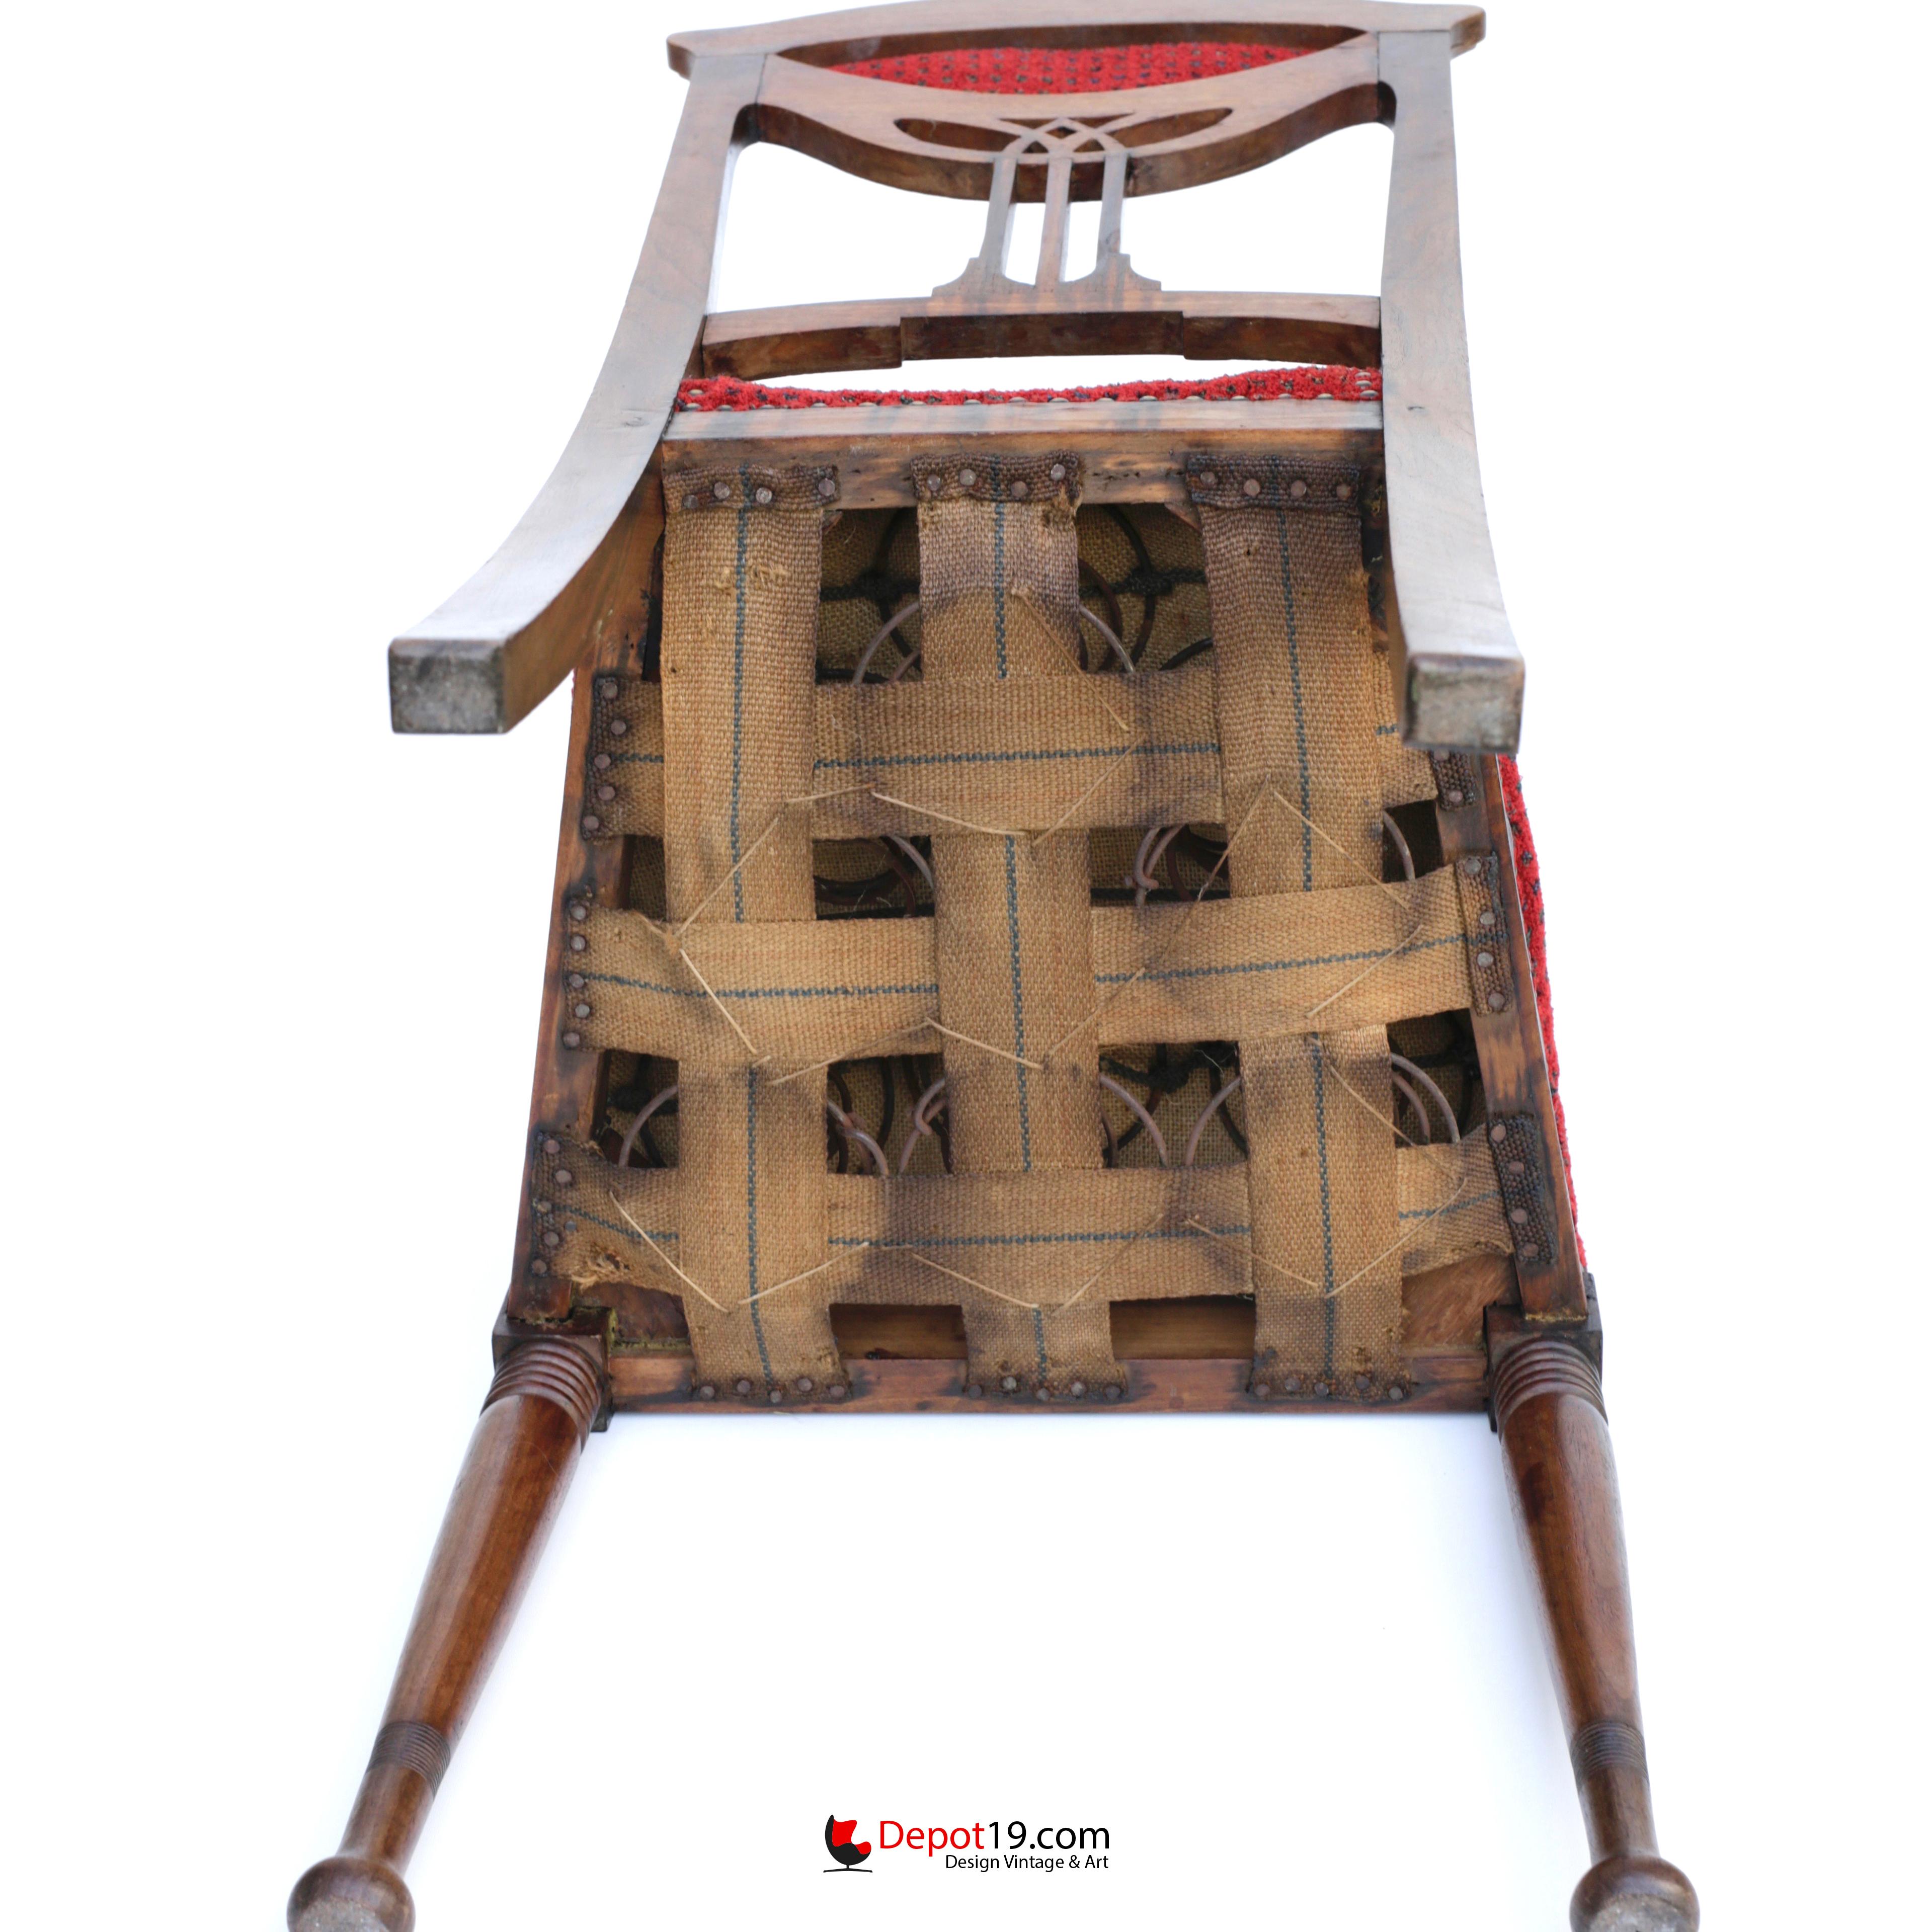 Art Nouveau Art Deco style chair with wood carvings | Depot 19